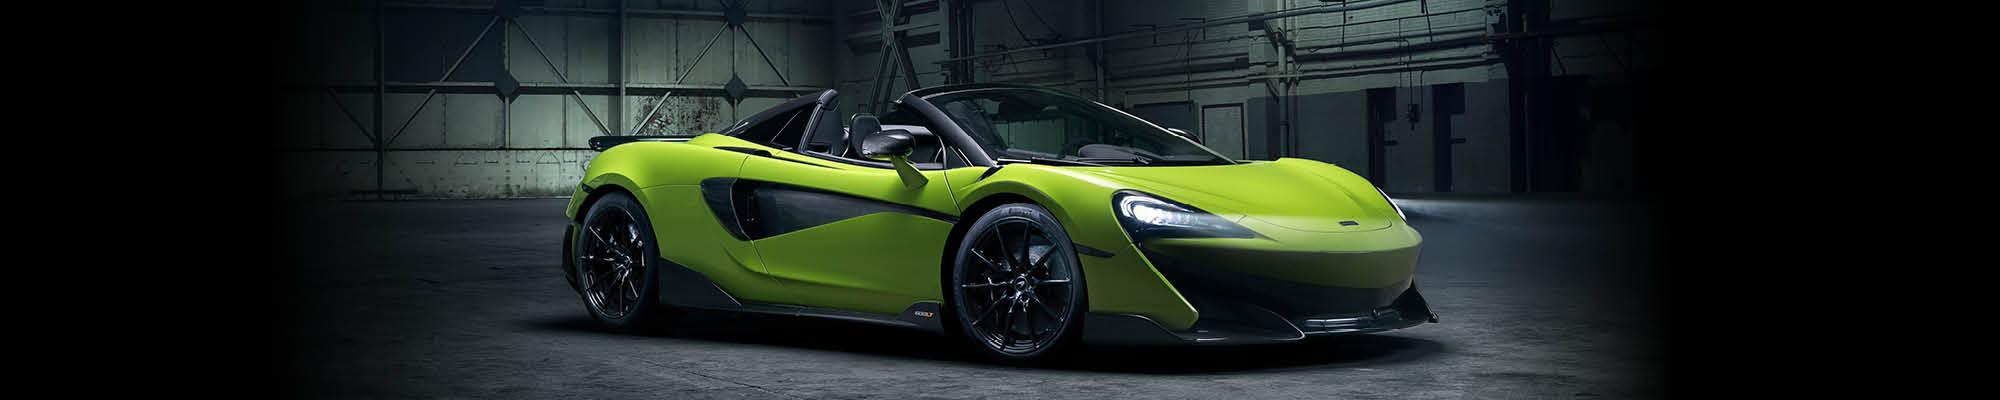 2020-McLaren-600LT-Spider